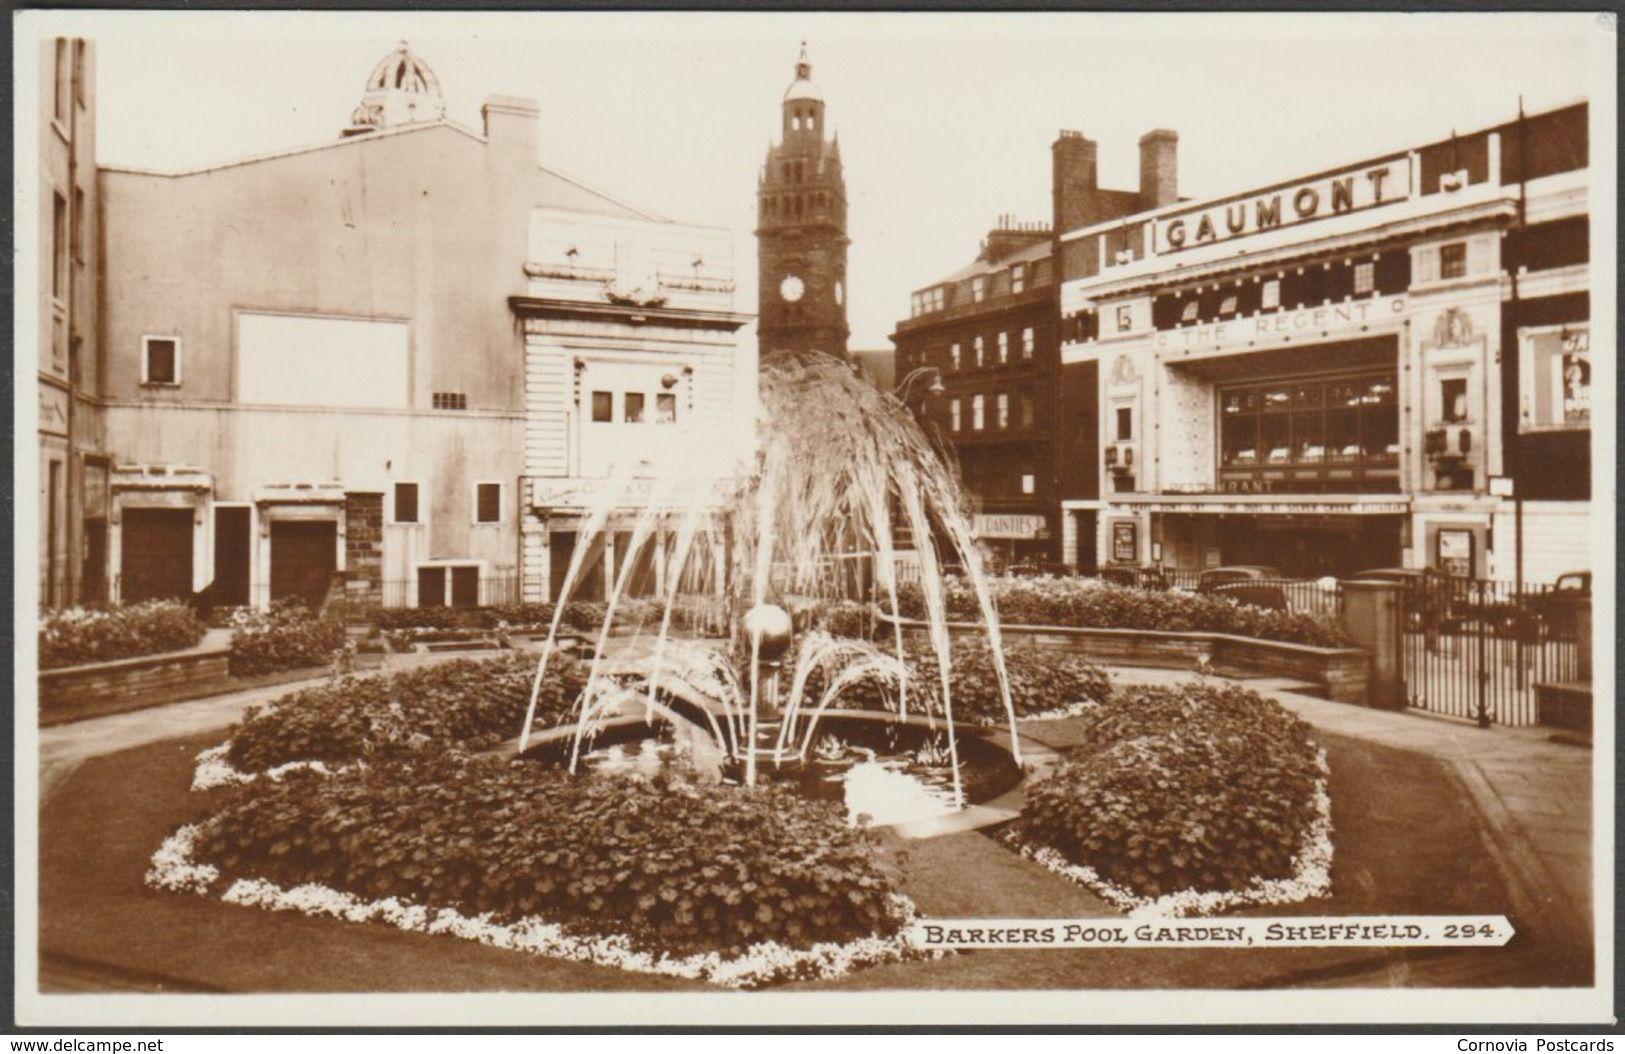 Barkers Pool Gardens, Sheffield, Yorkshire, c.1950 - Bamforth RP ...